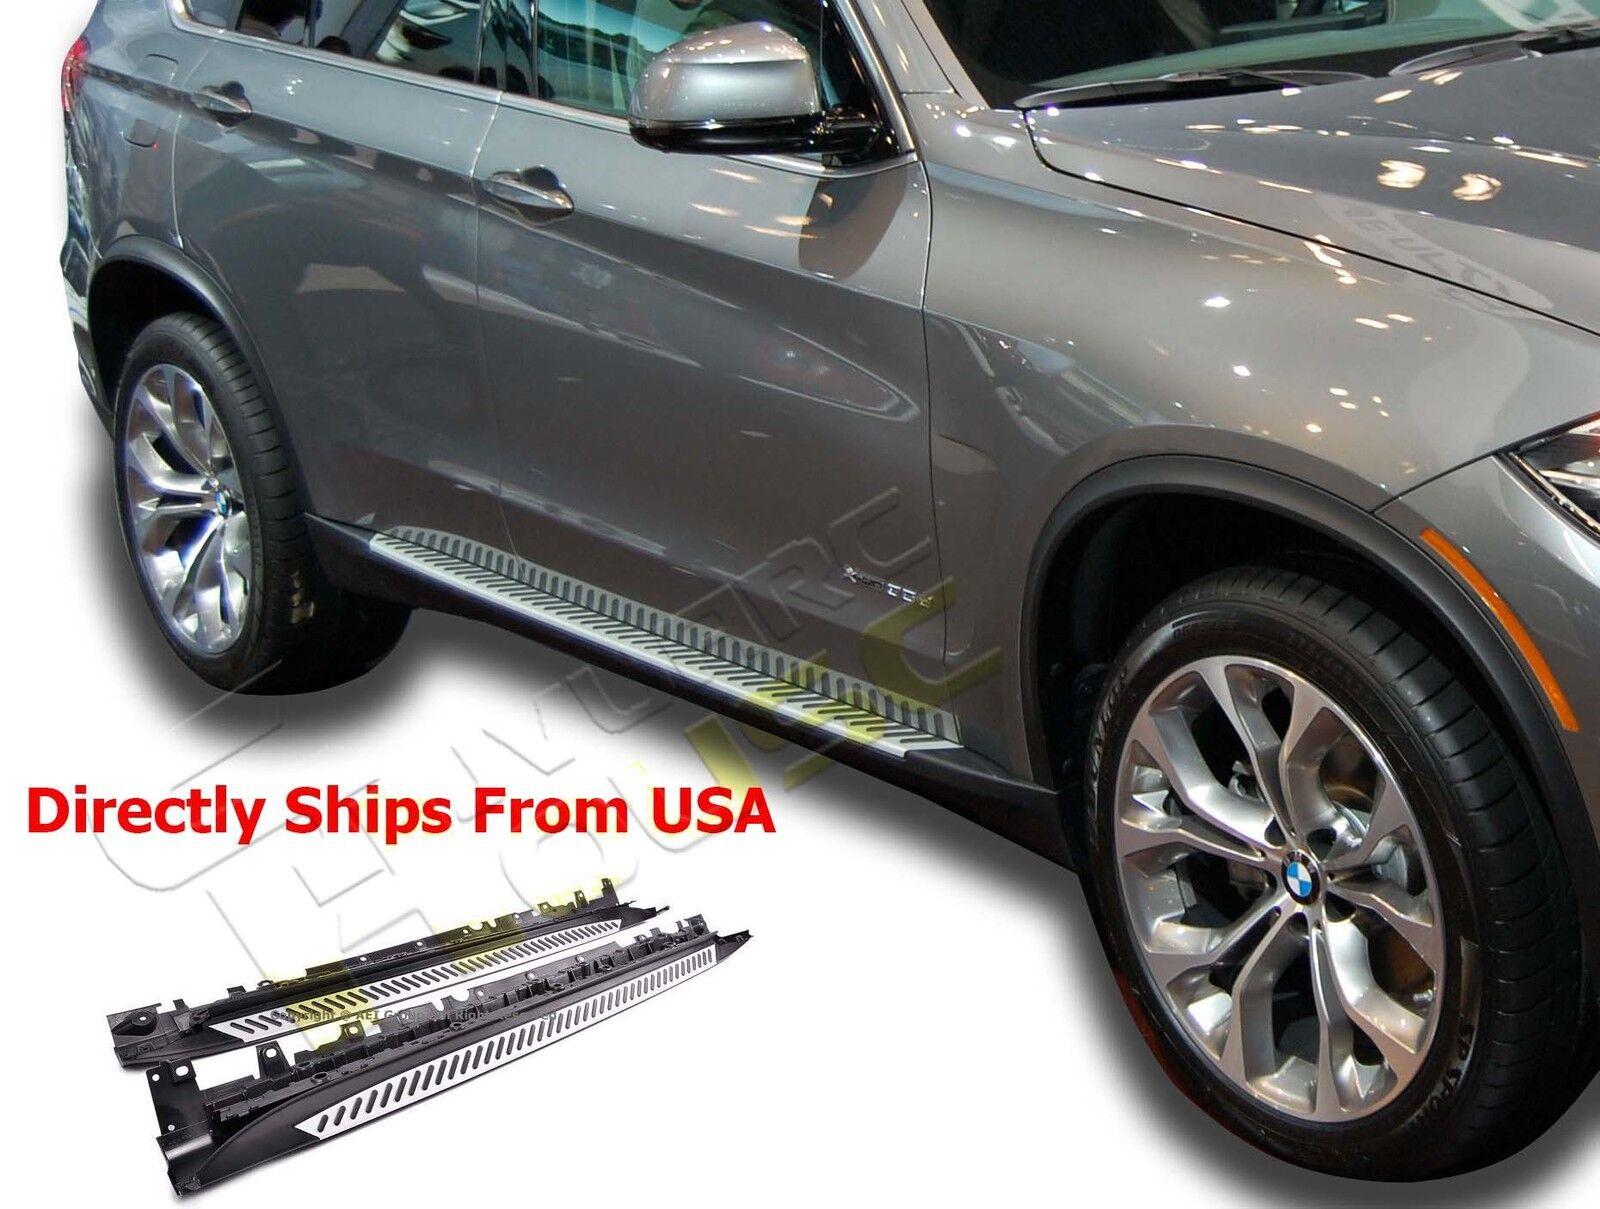 VANGUARD 07-13 BMW X5 E70 SIDE STEP OE FACTORY STYLE ALUMINUM RUNNING BOARD